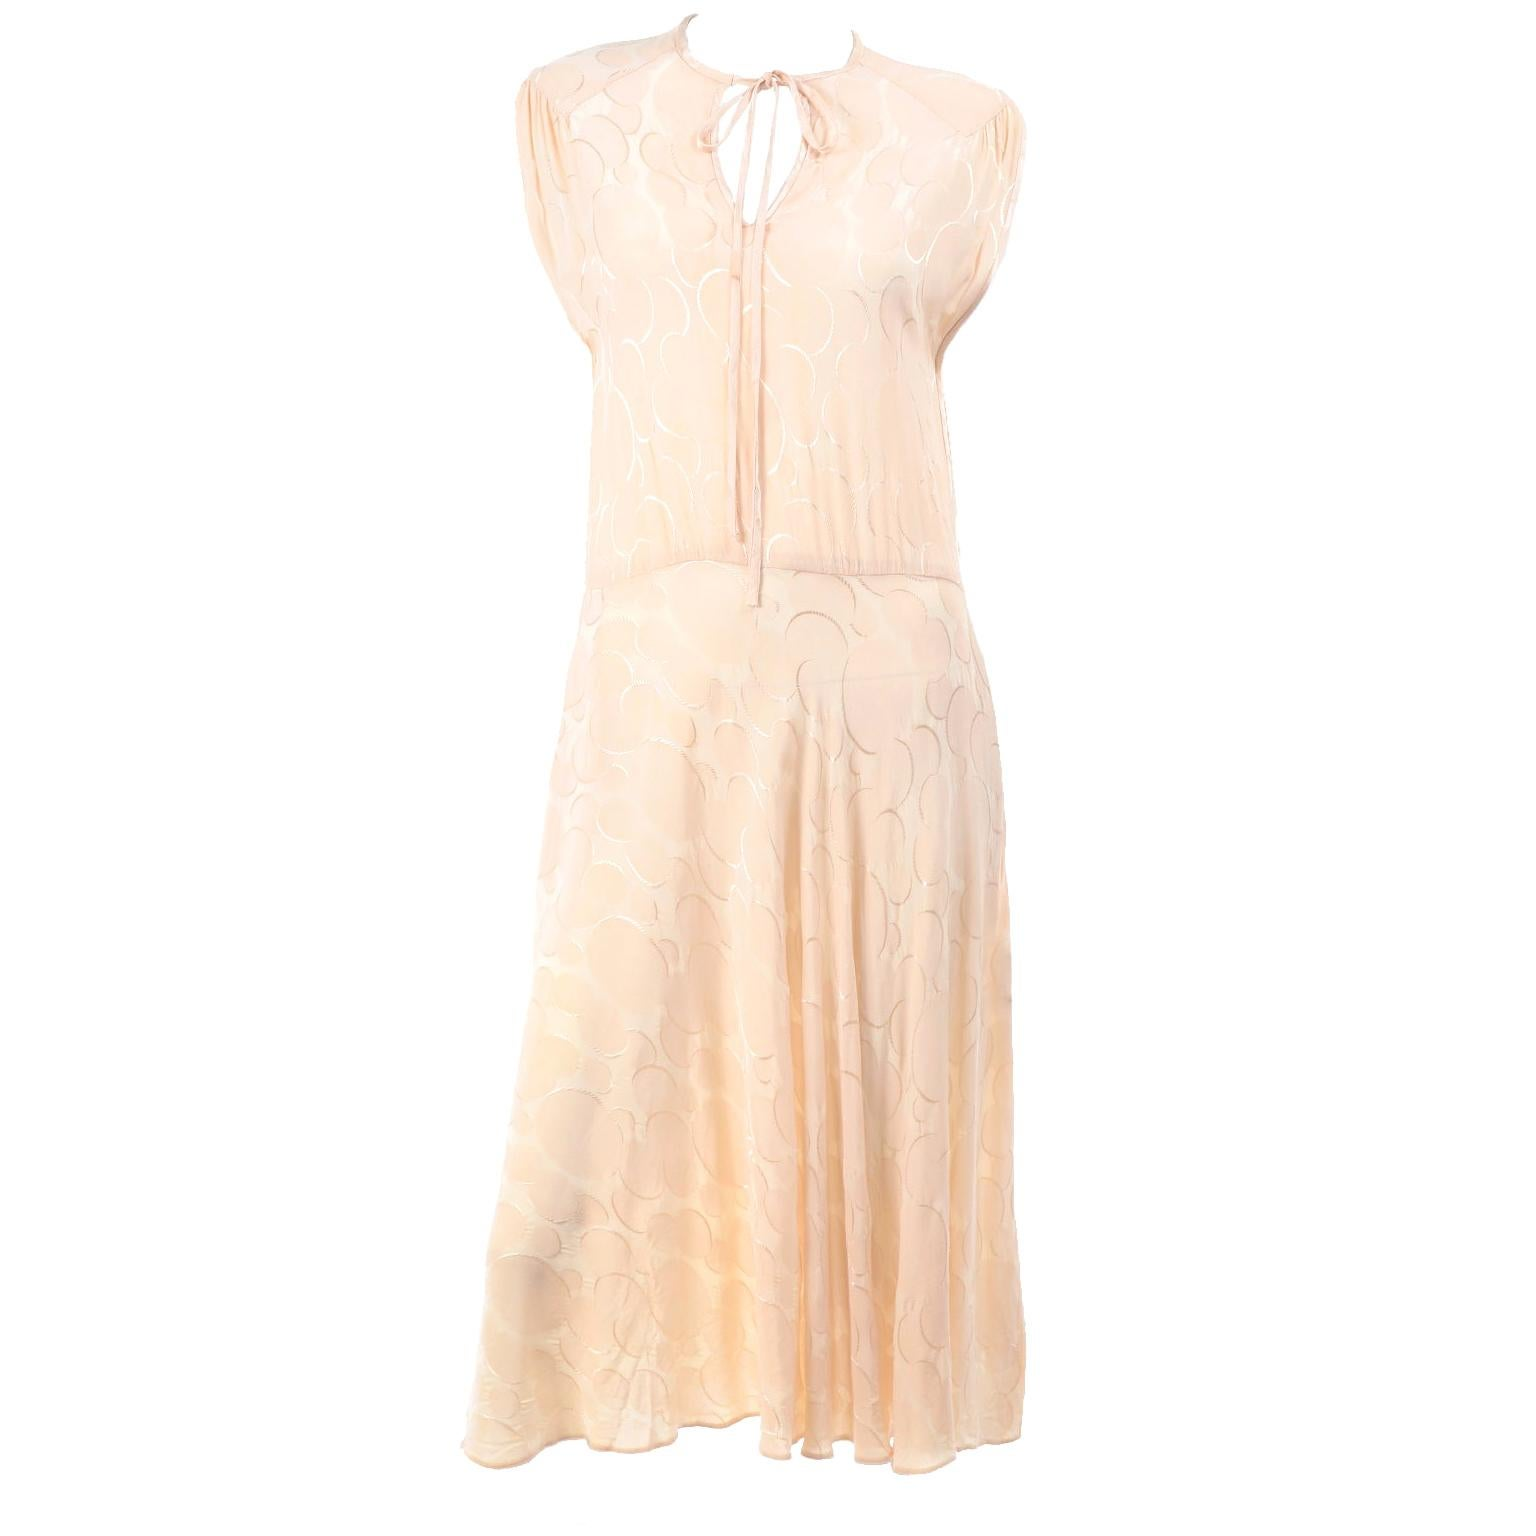 1970s Vintage Albert Nipon Cream Silk Tonal Circle Print Dress W V- Neck & tie